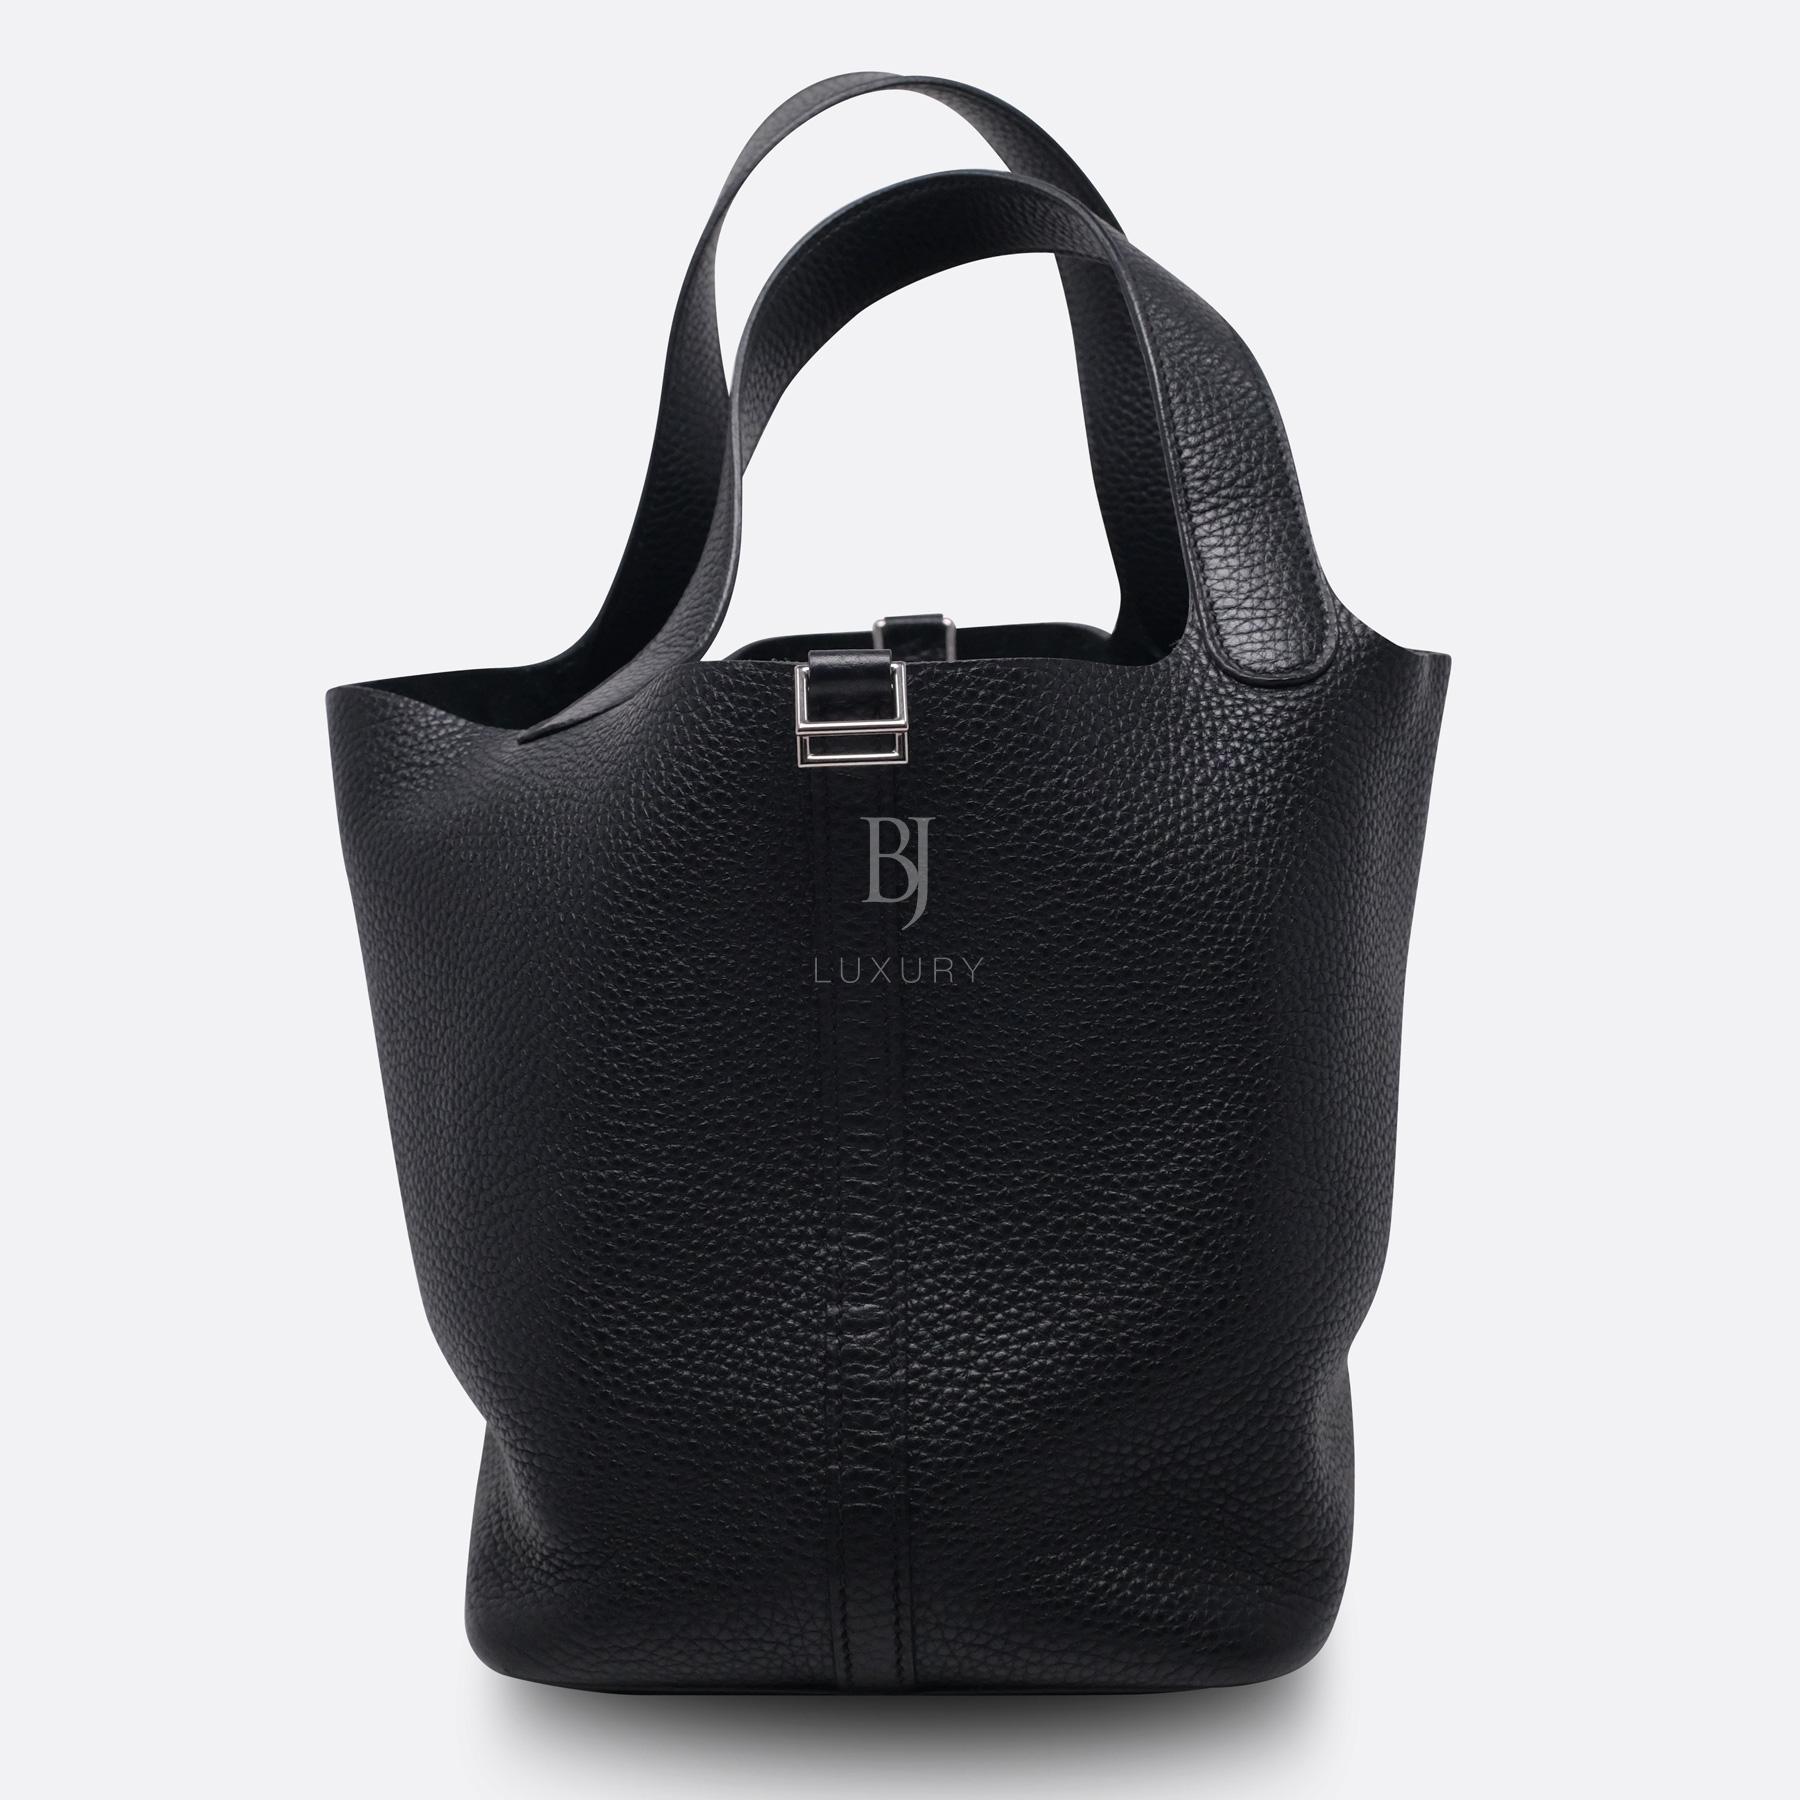 Hermes Picotin 22 Palladium Clemence BJ Luxury 1.jpg